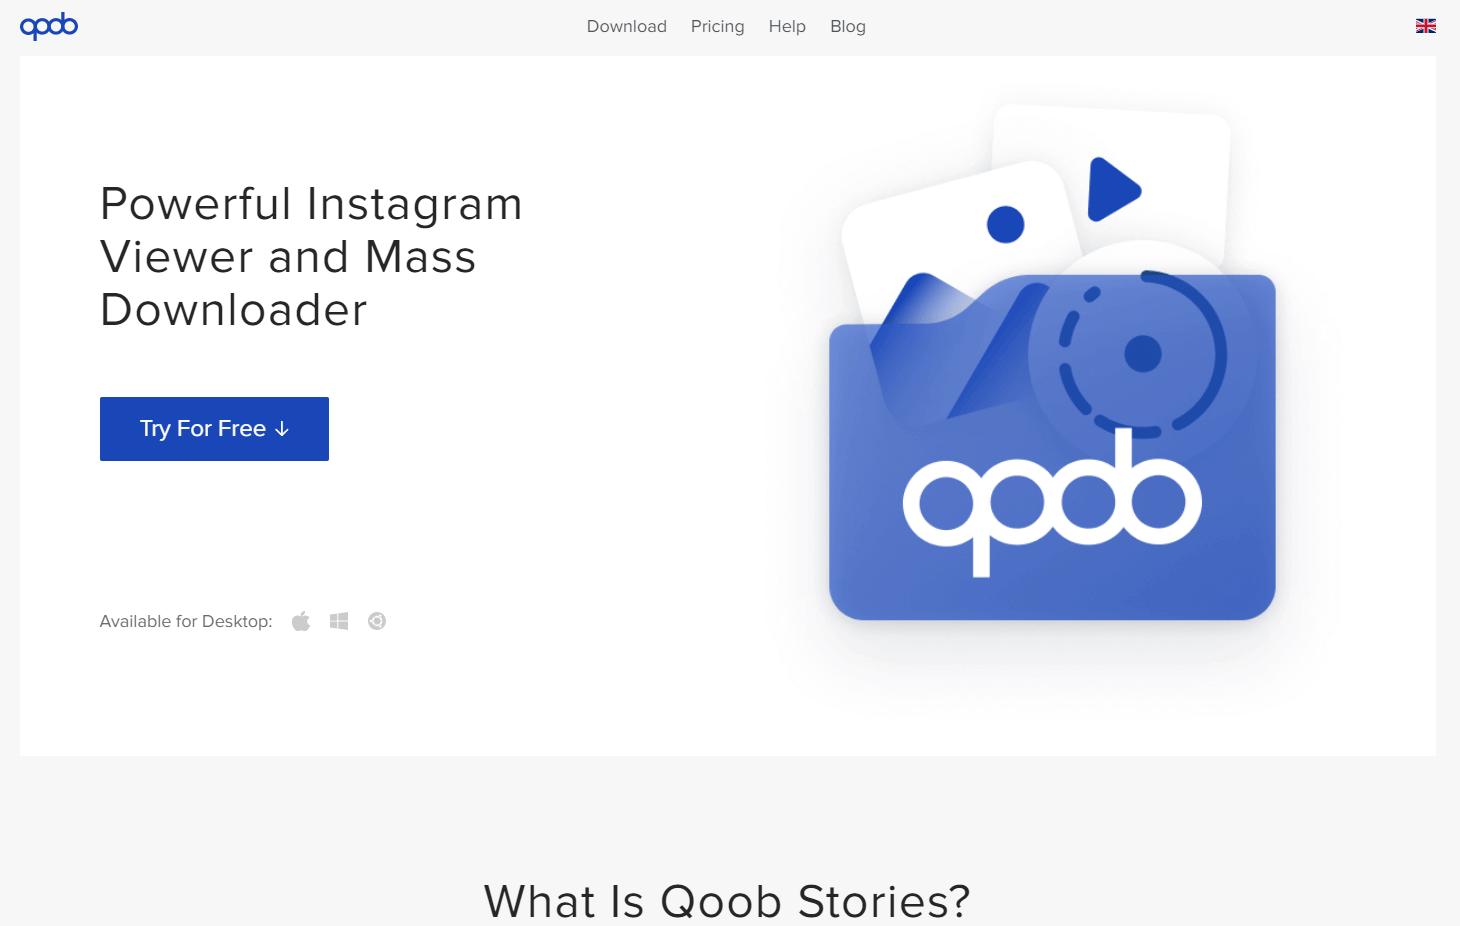 Qoob Stories